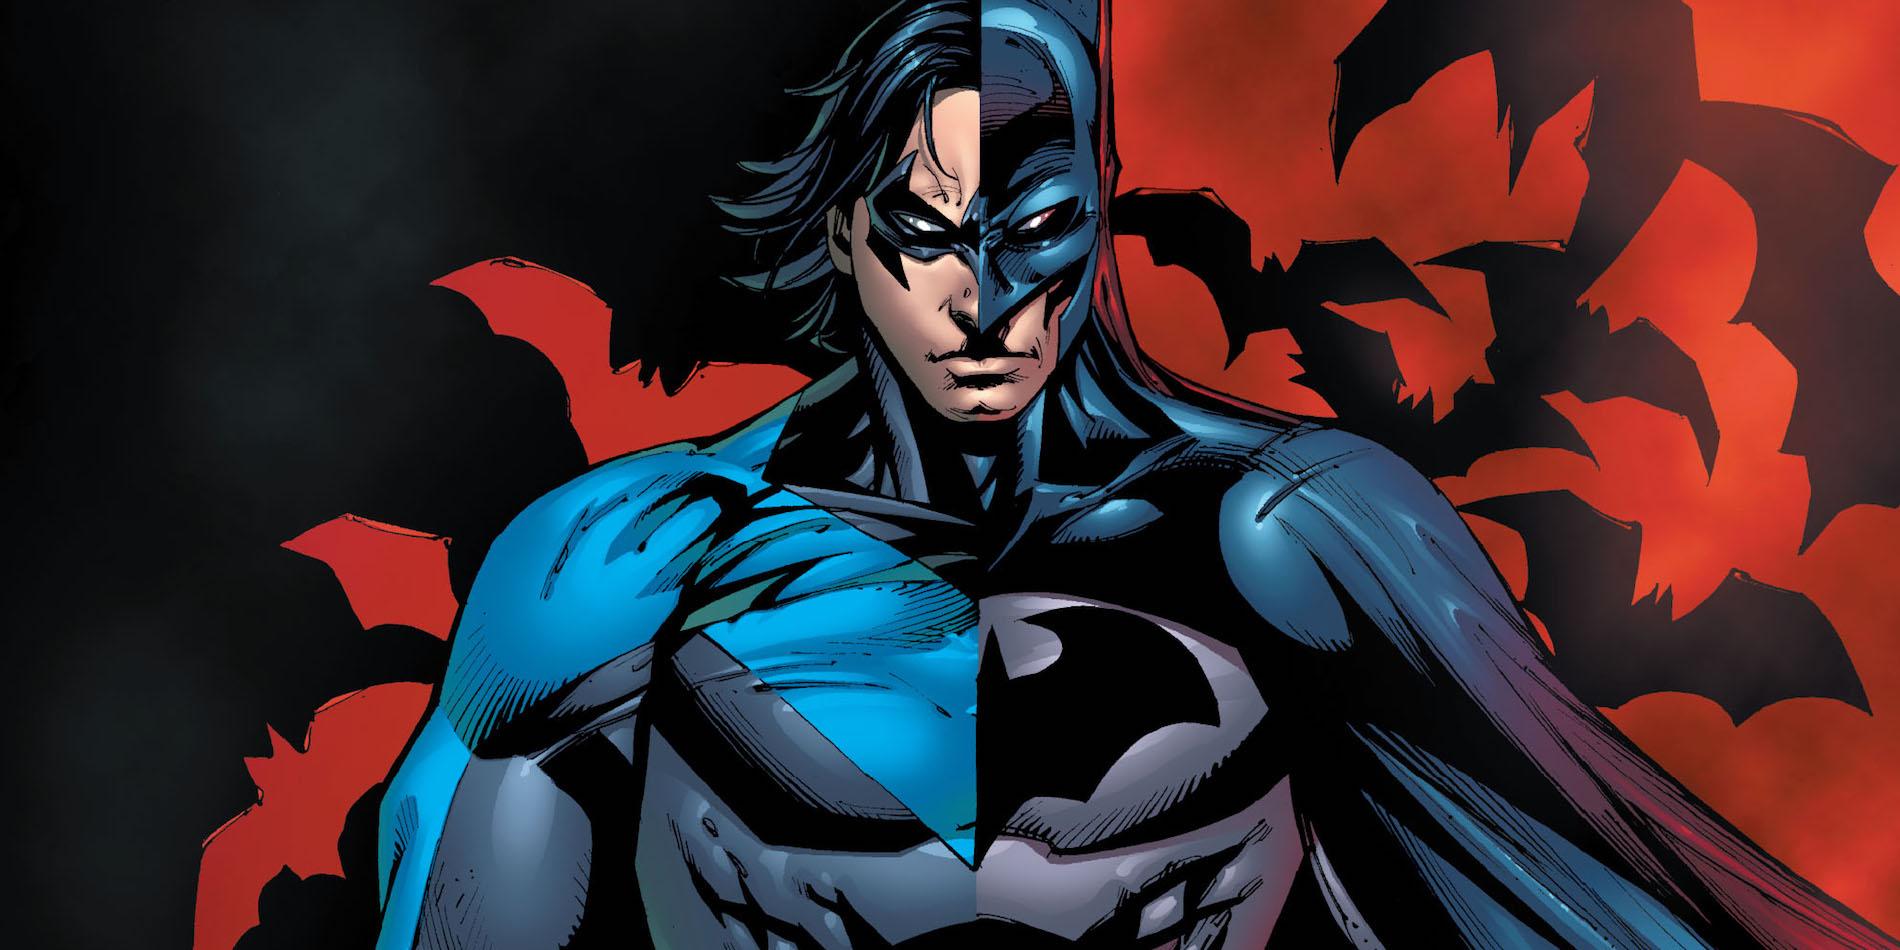 Dick Grayson as Batman in DC Comics